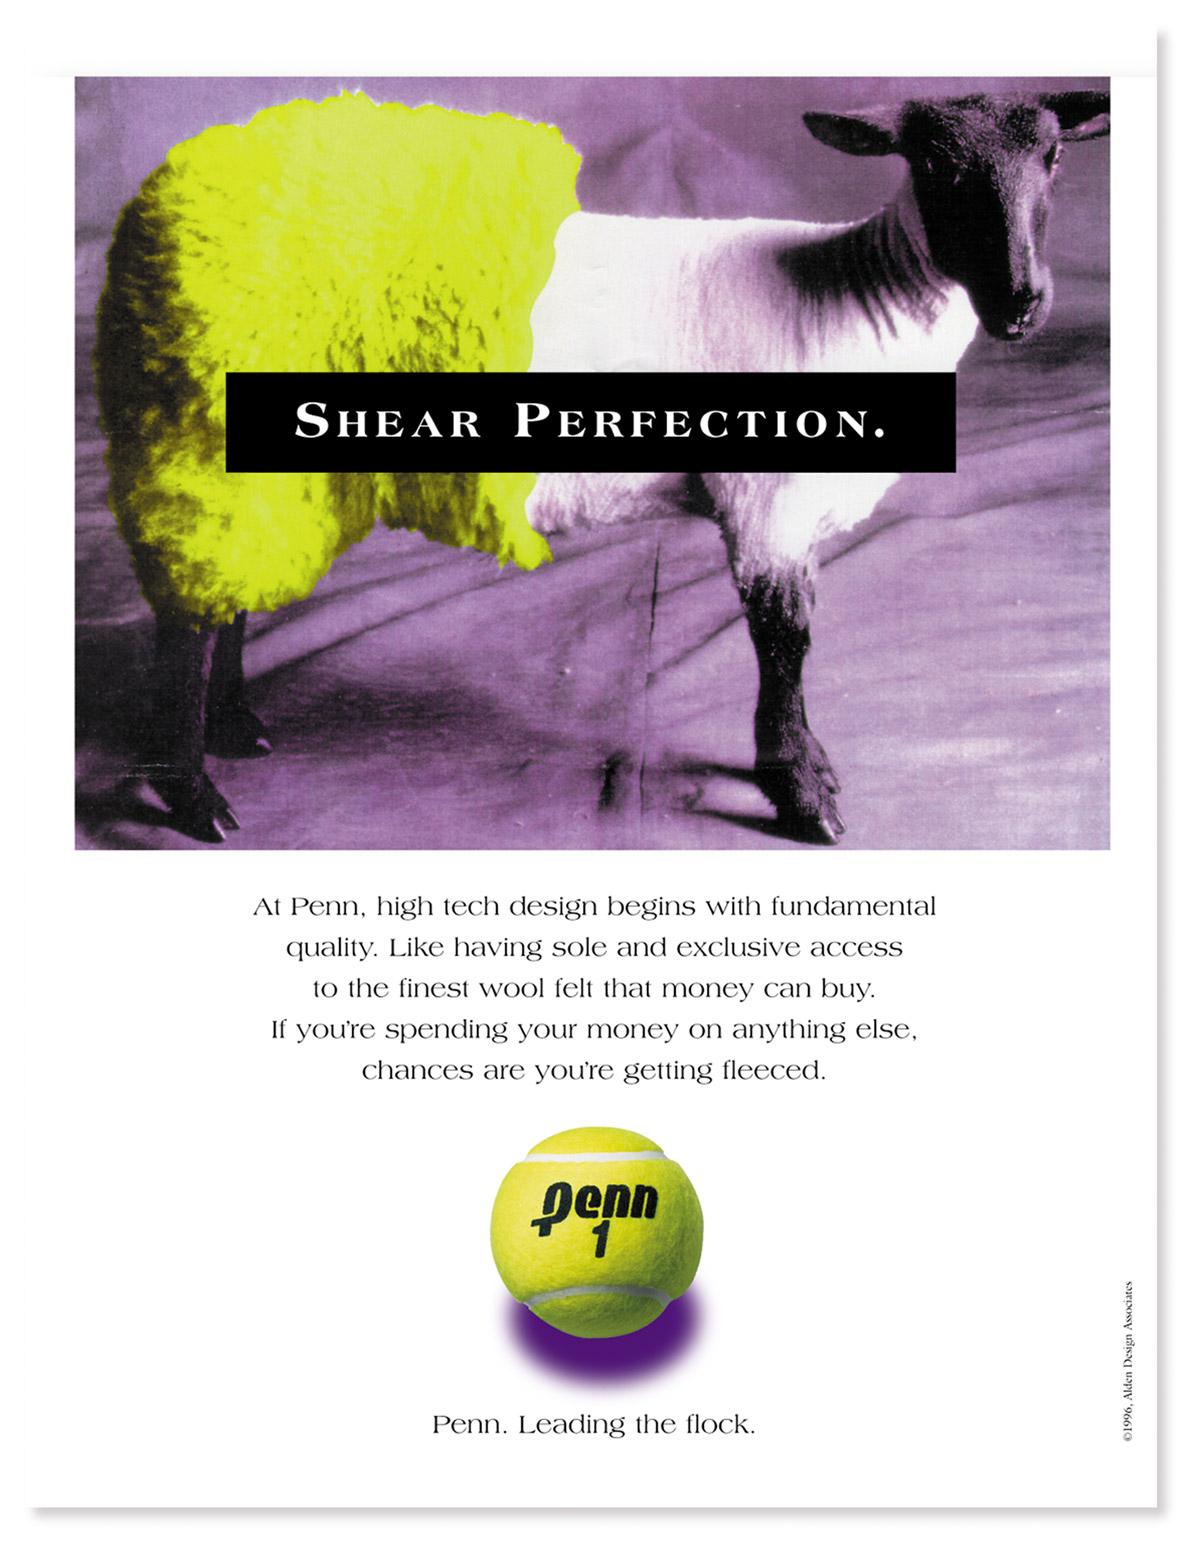 Head Penn Advertising